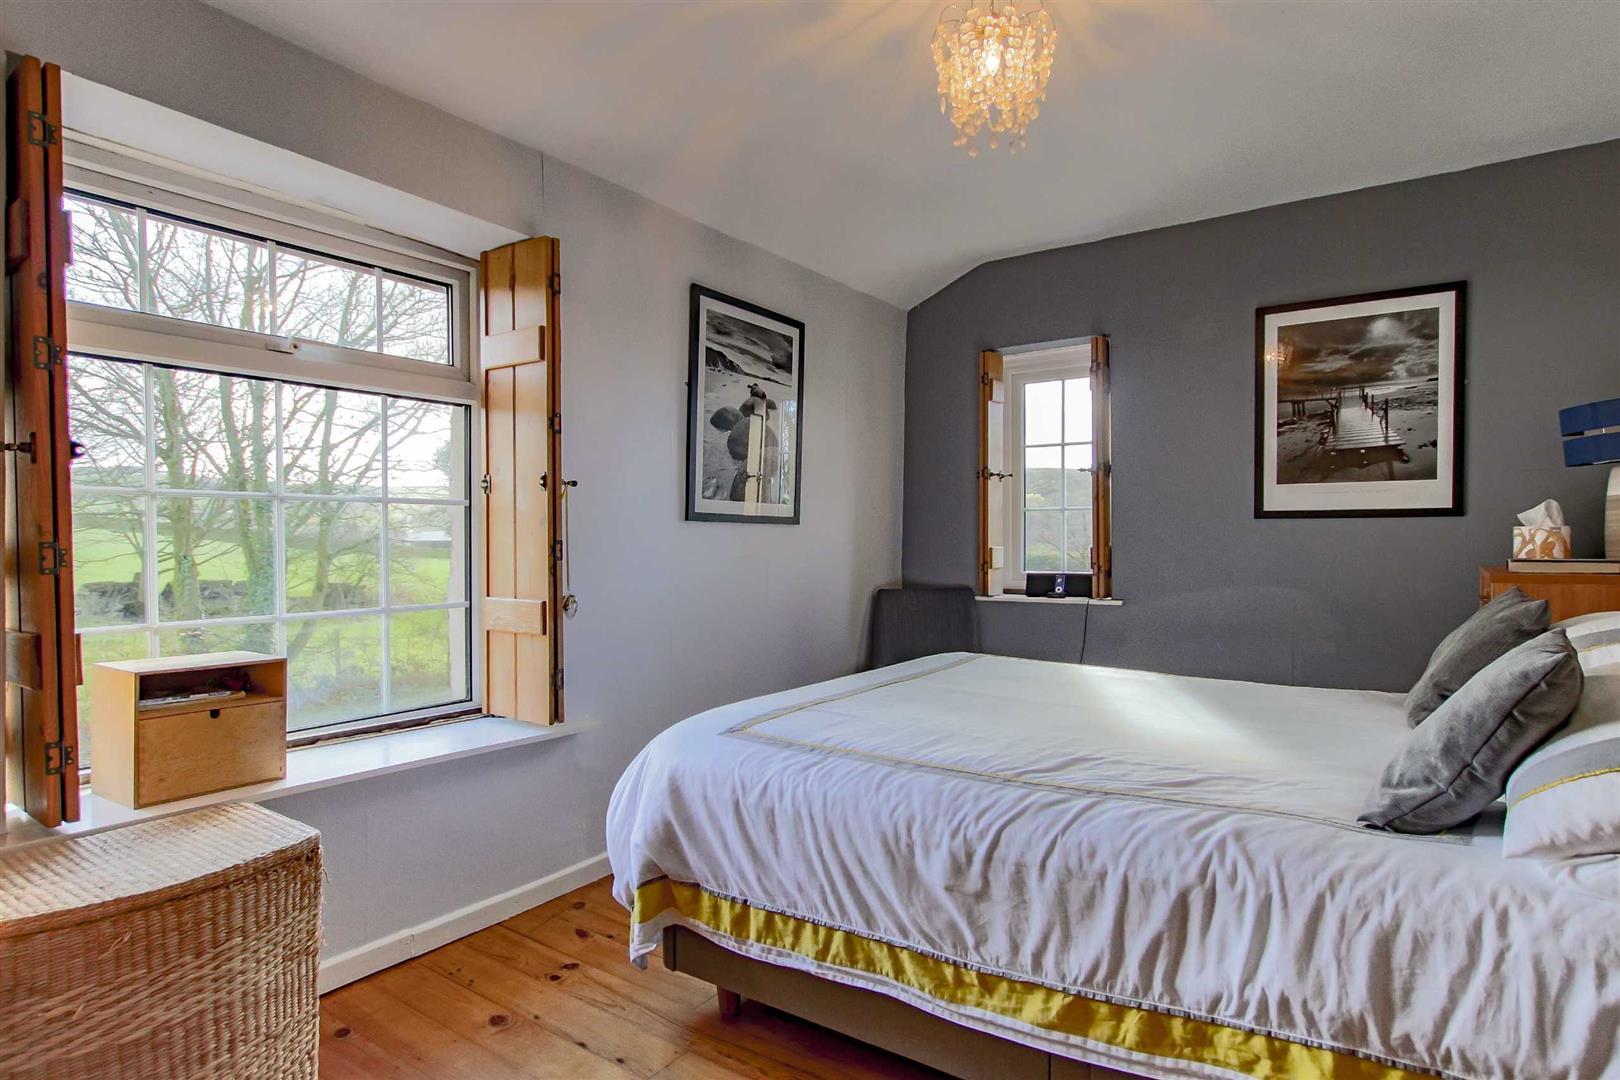 4 Bedroom Detached House For Sale - p033686_22.jpg